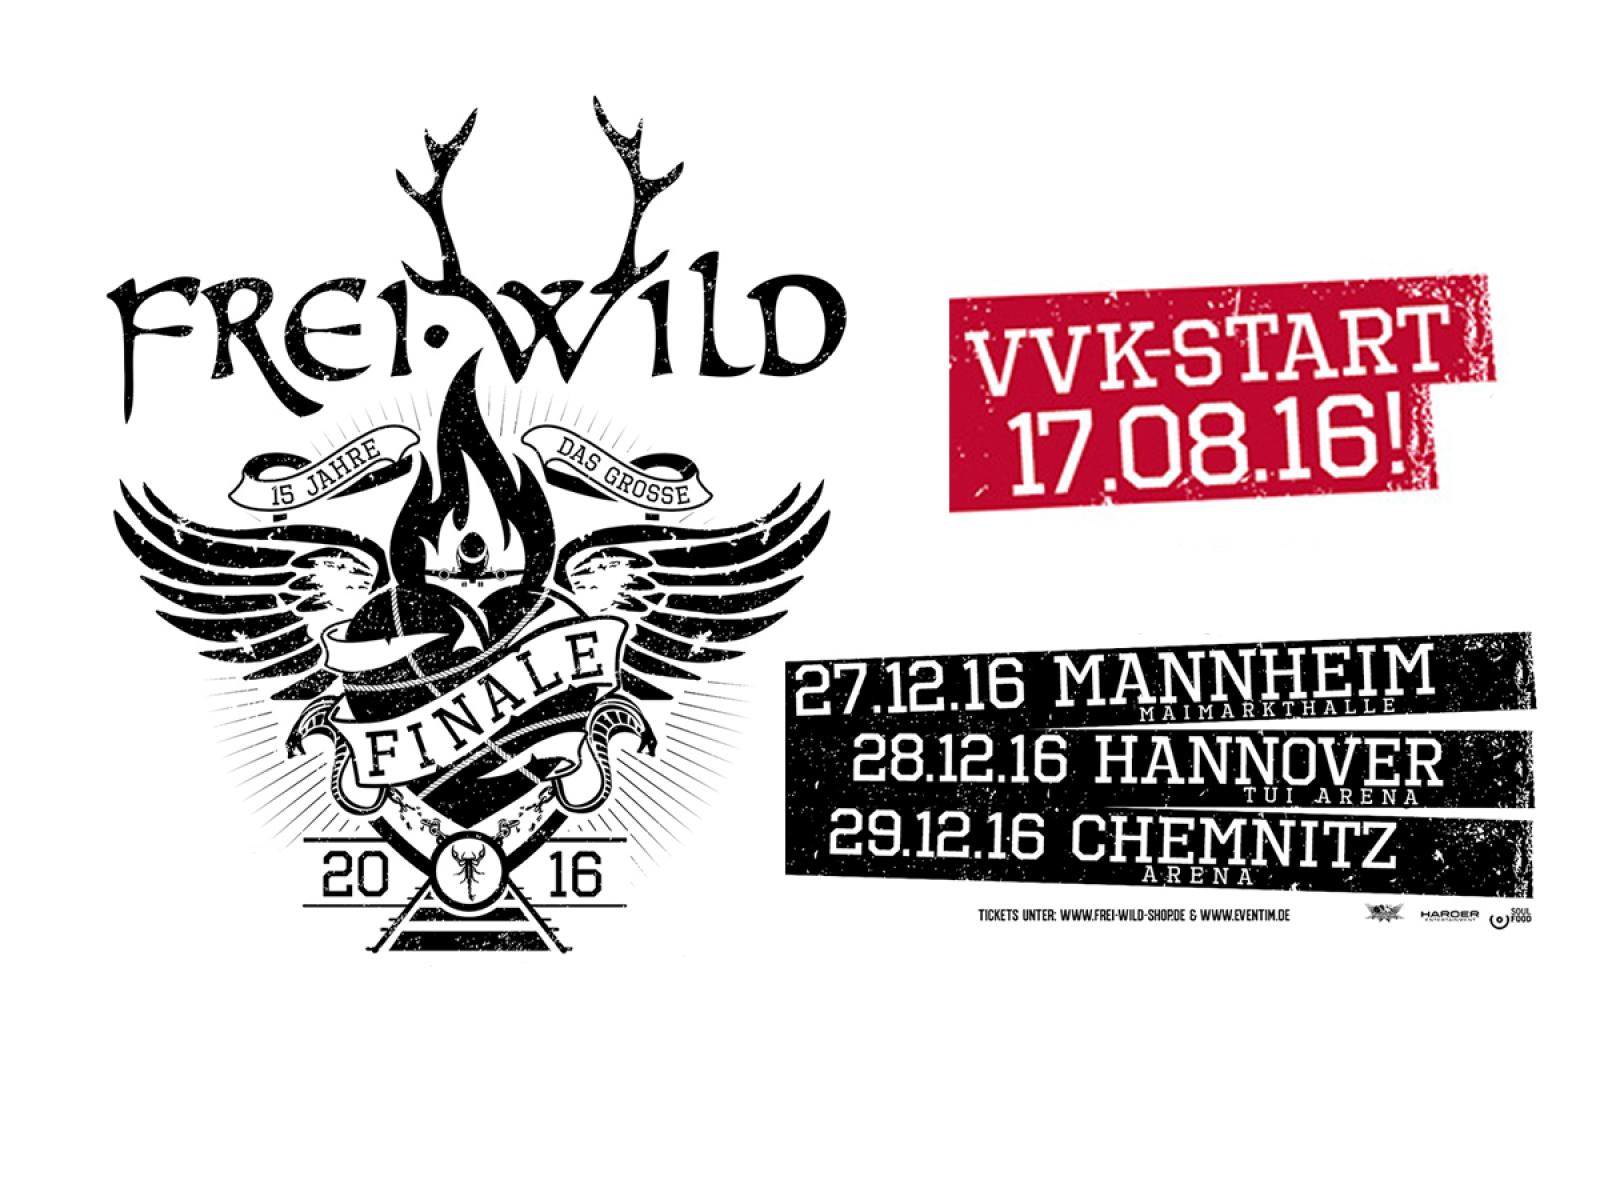 Newsletter 14082016 Freiwild Is Going Freiwild